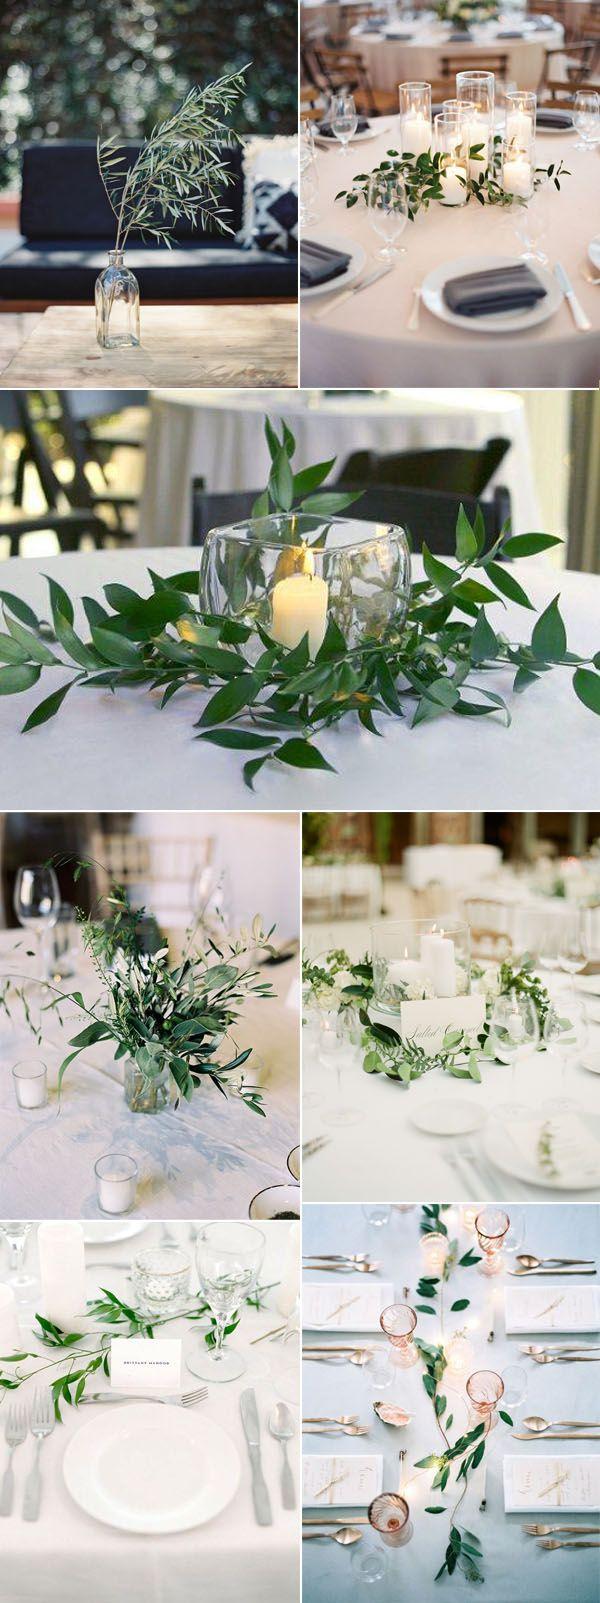 2017 2018 trends easy diy organic minimalist wedding ideas creative botanical wedding table centerpieces for minimalist weddings junglespirit Images